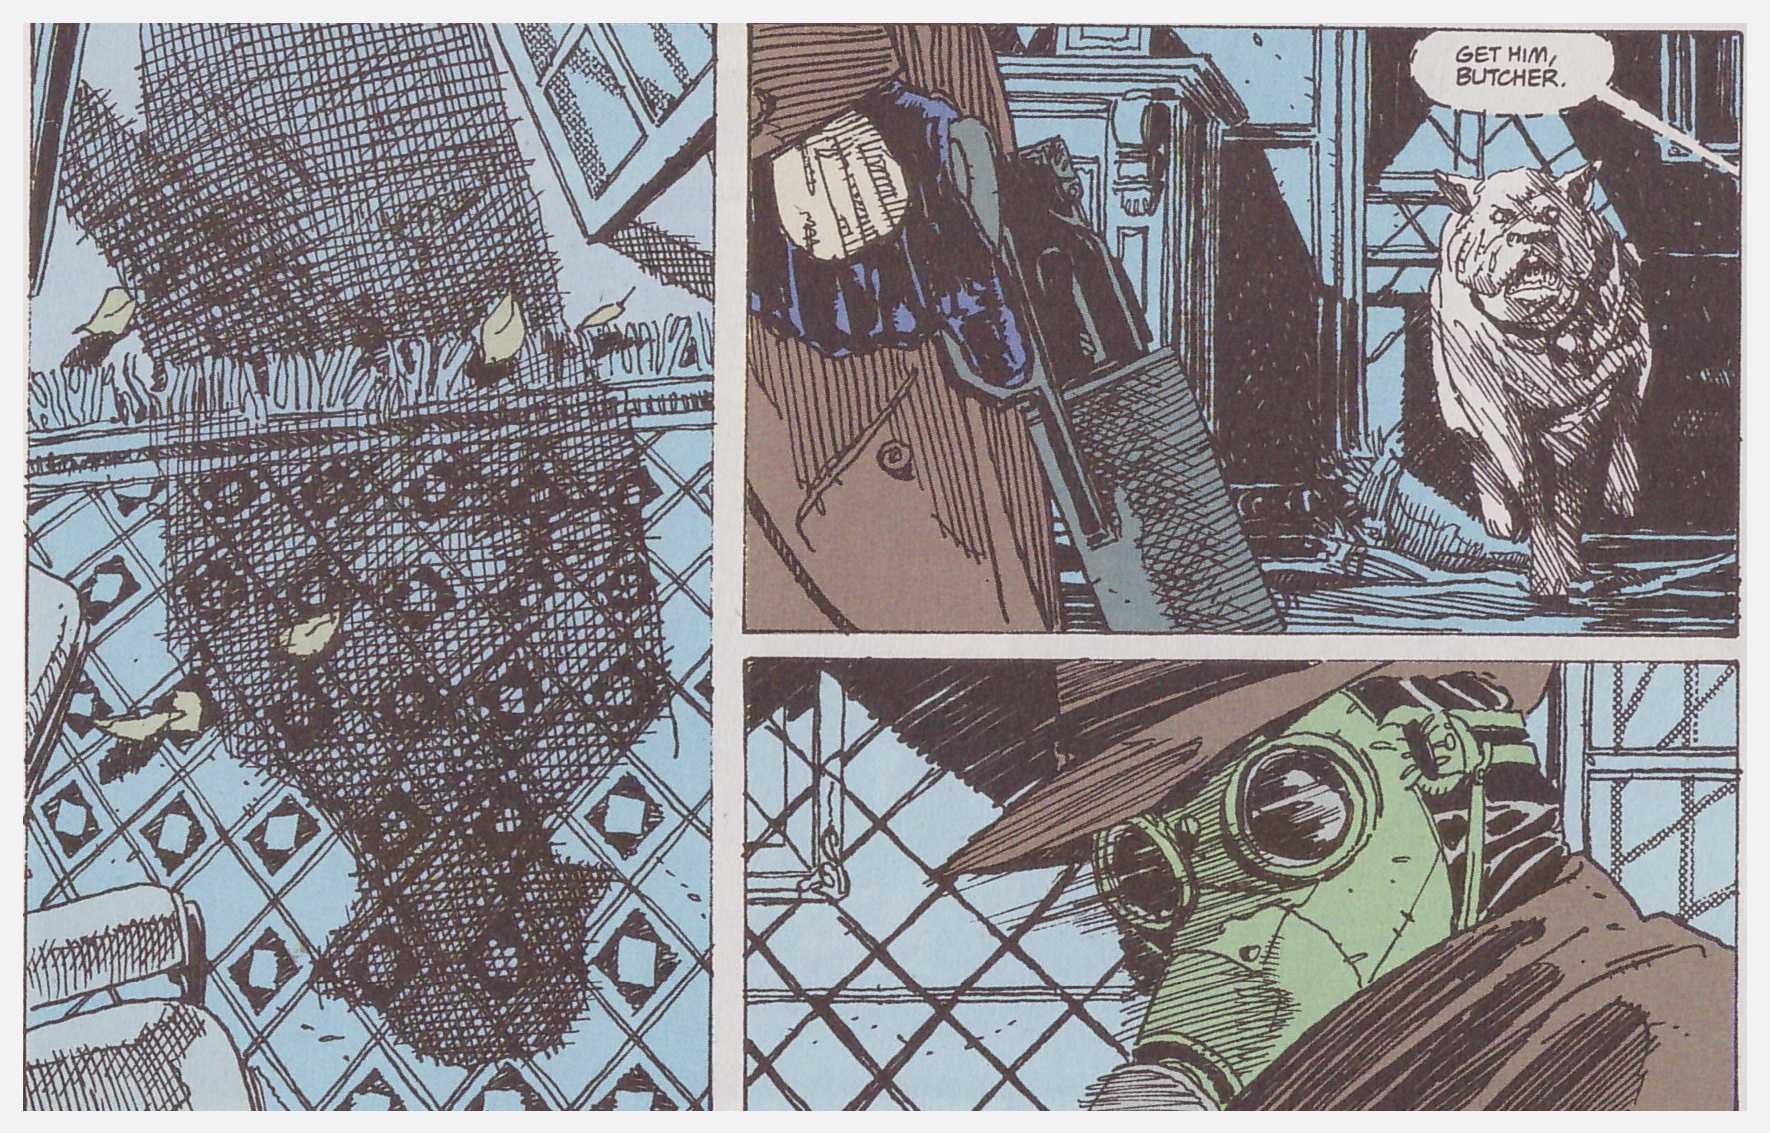 Sandman Mystery The Tarantula review